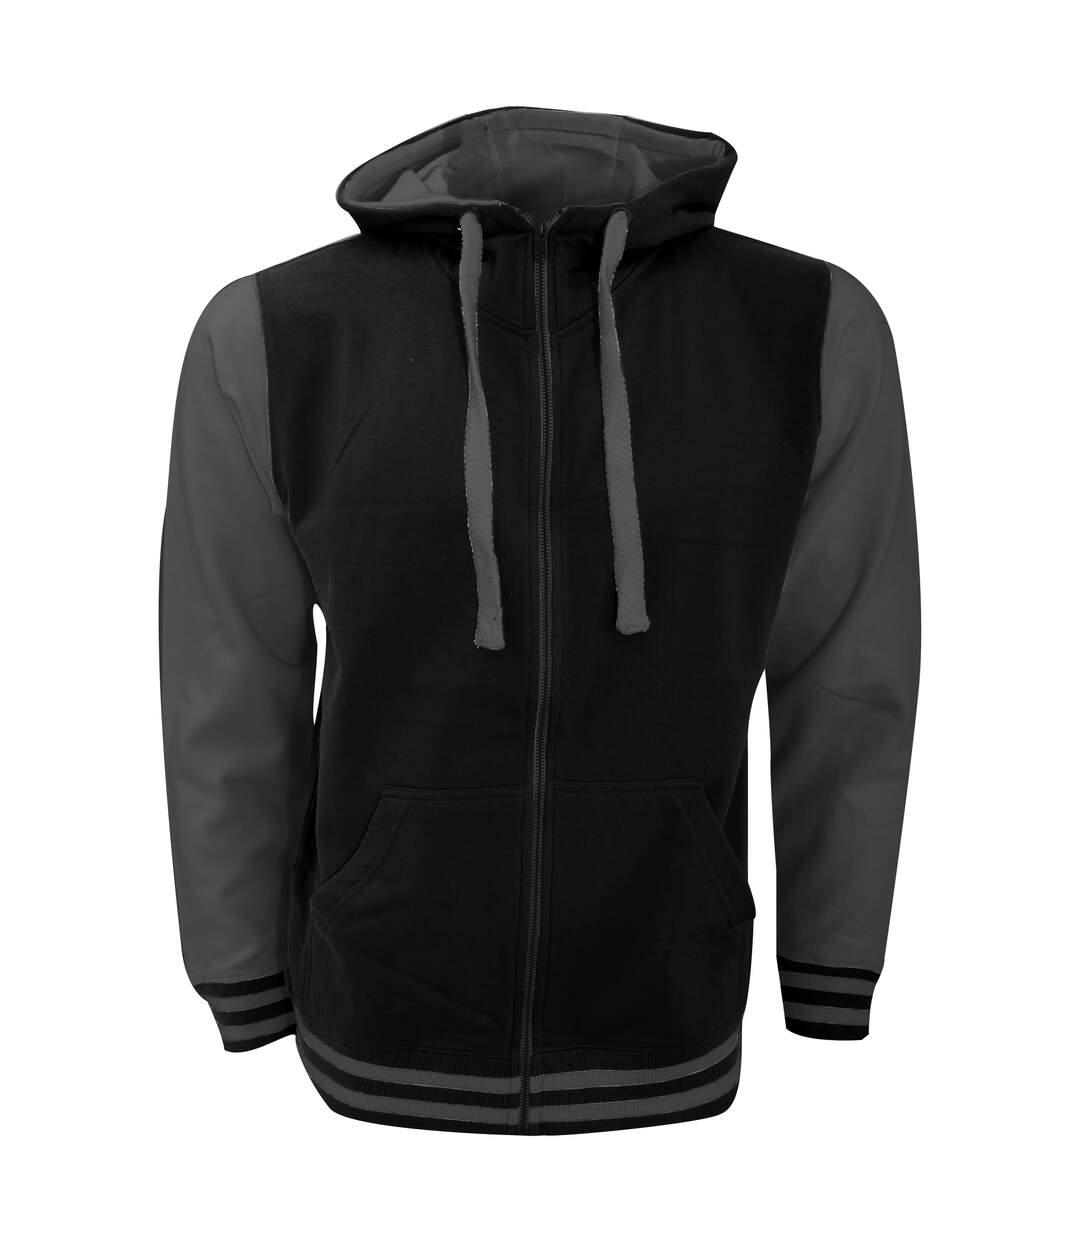 FDM Mens Active Zip Hoodie (Black/Charcoal) - UTBC3183